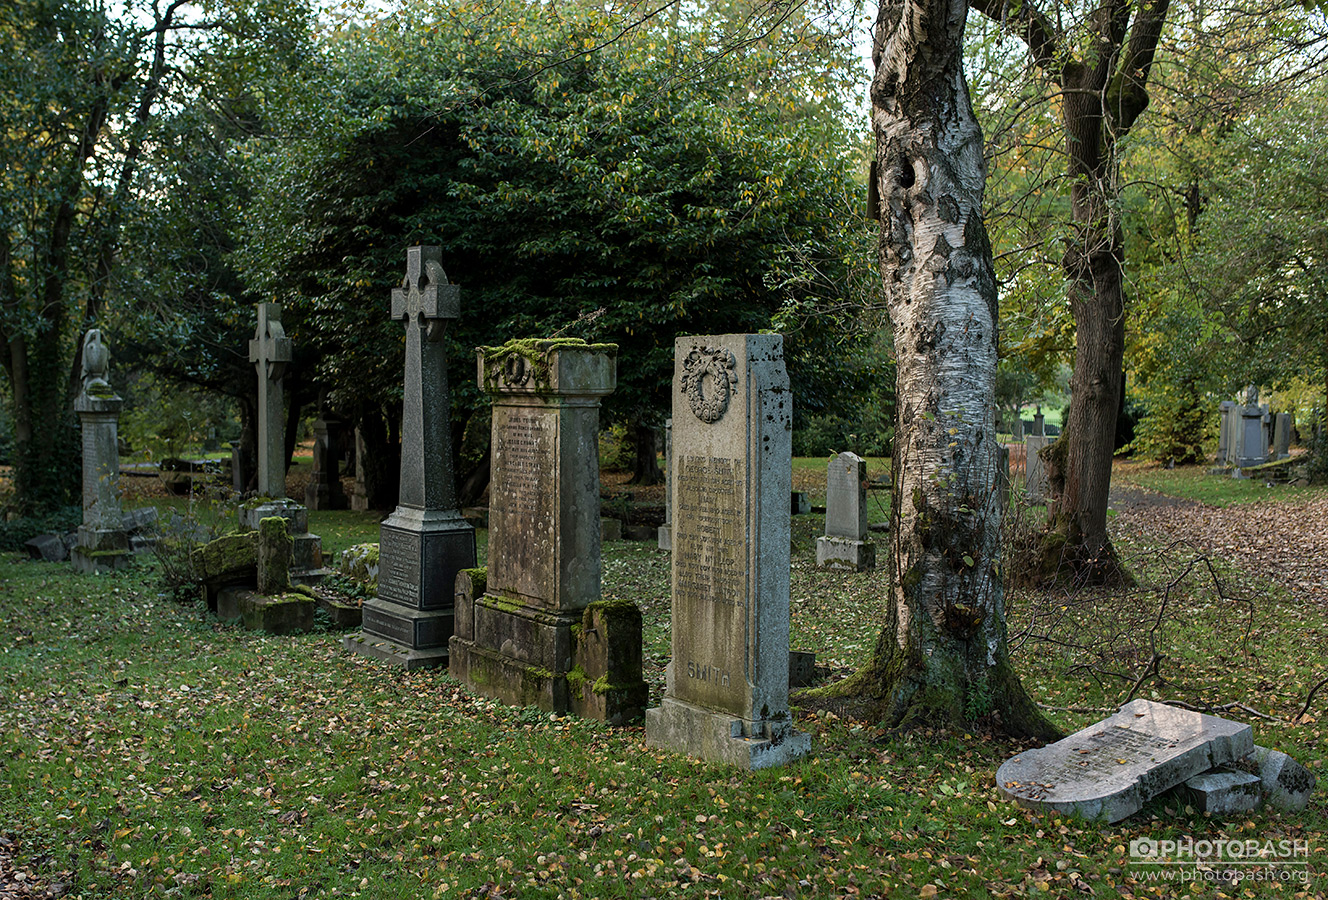 Scotland-Cemetery-Gothic-Gravestones.jpg